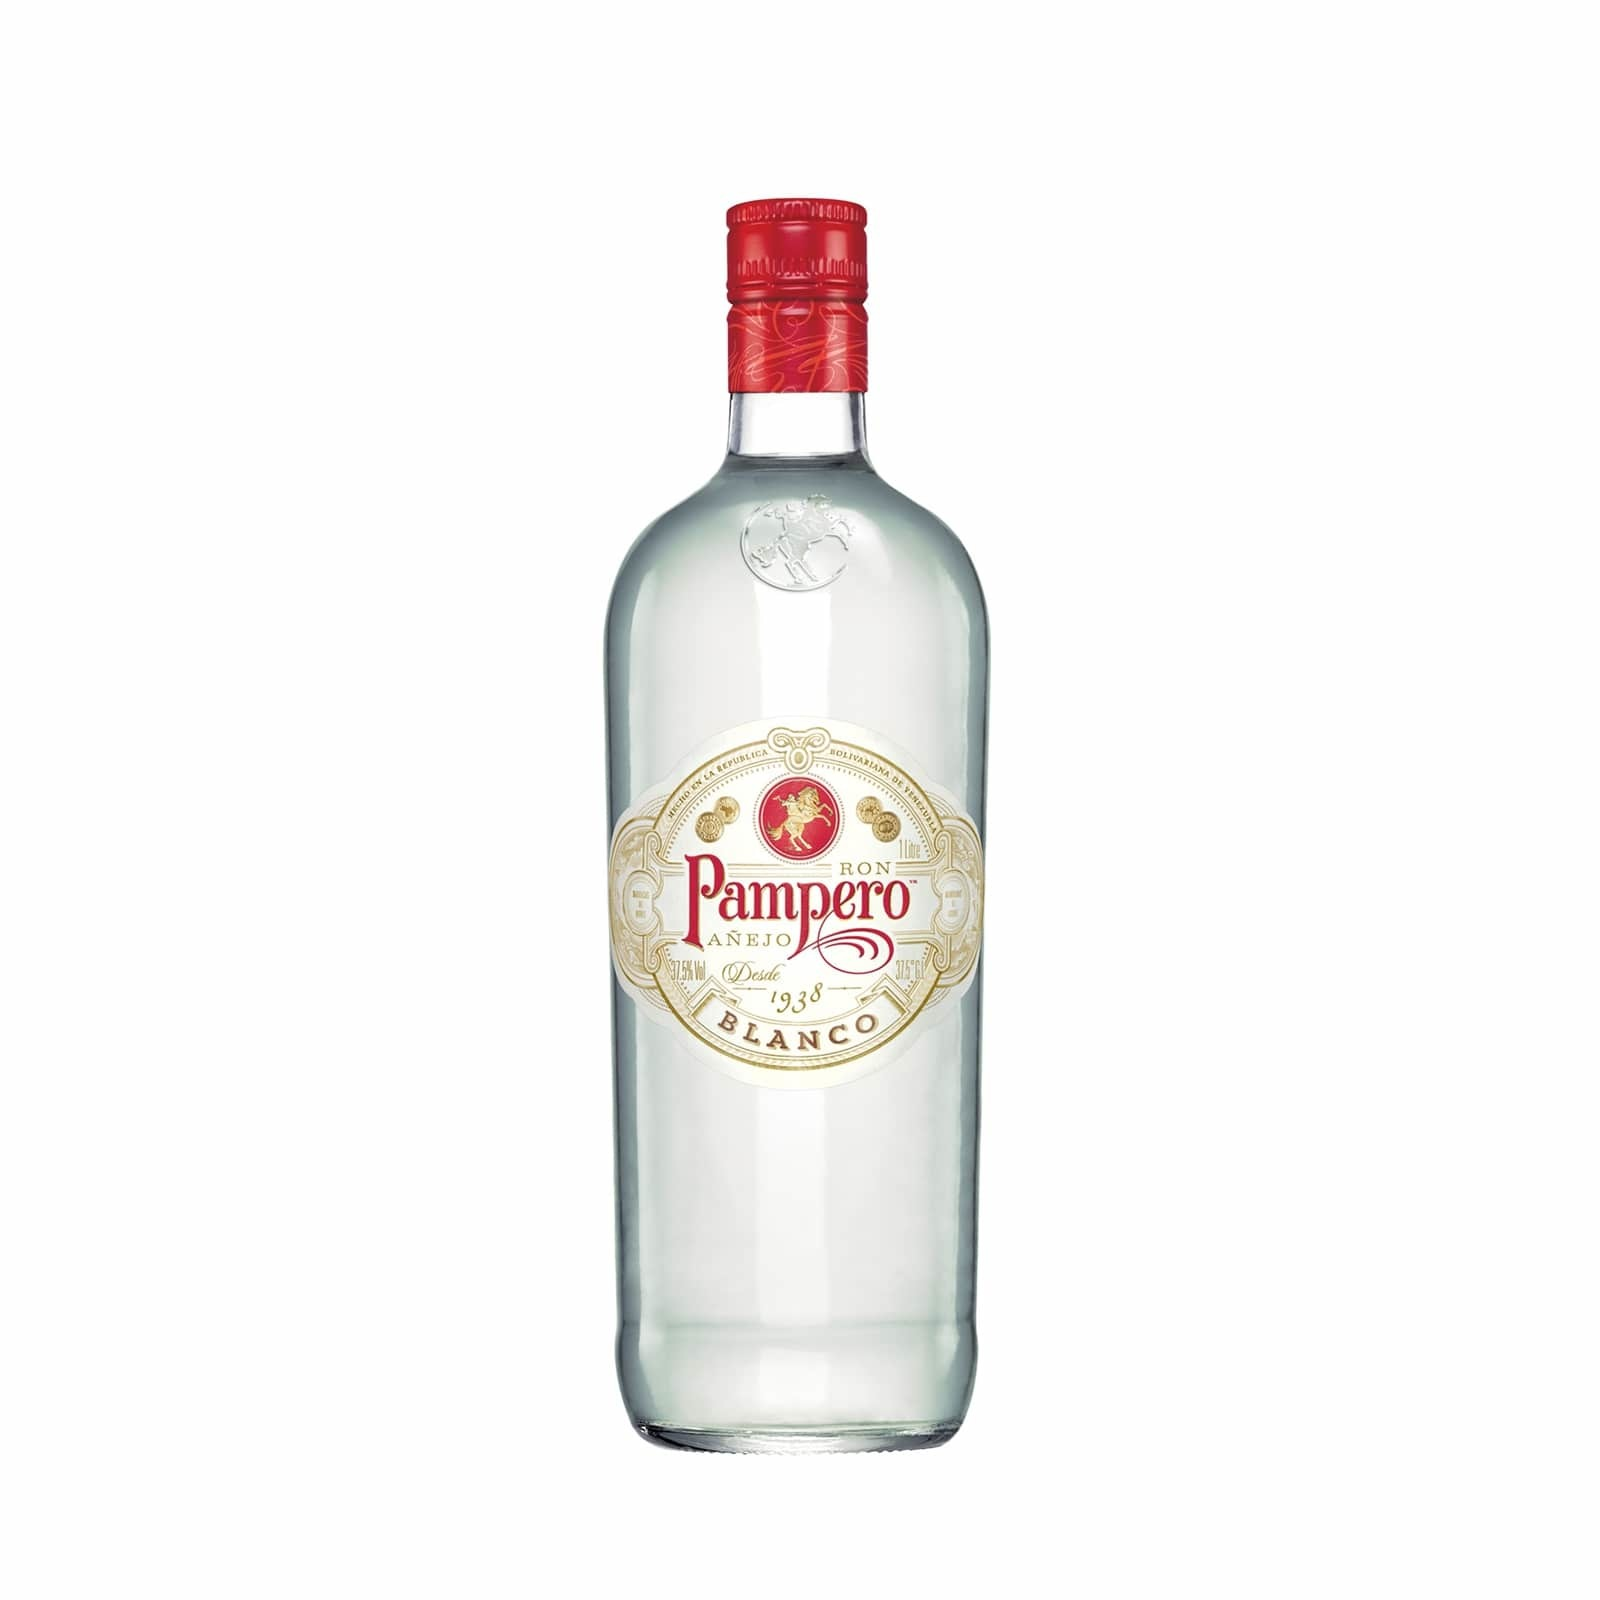 Pampero Blanco White Rum